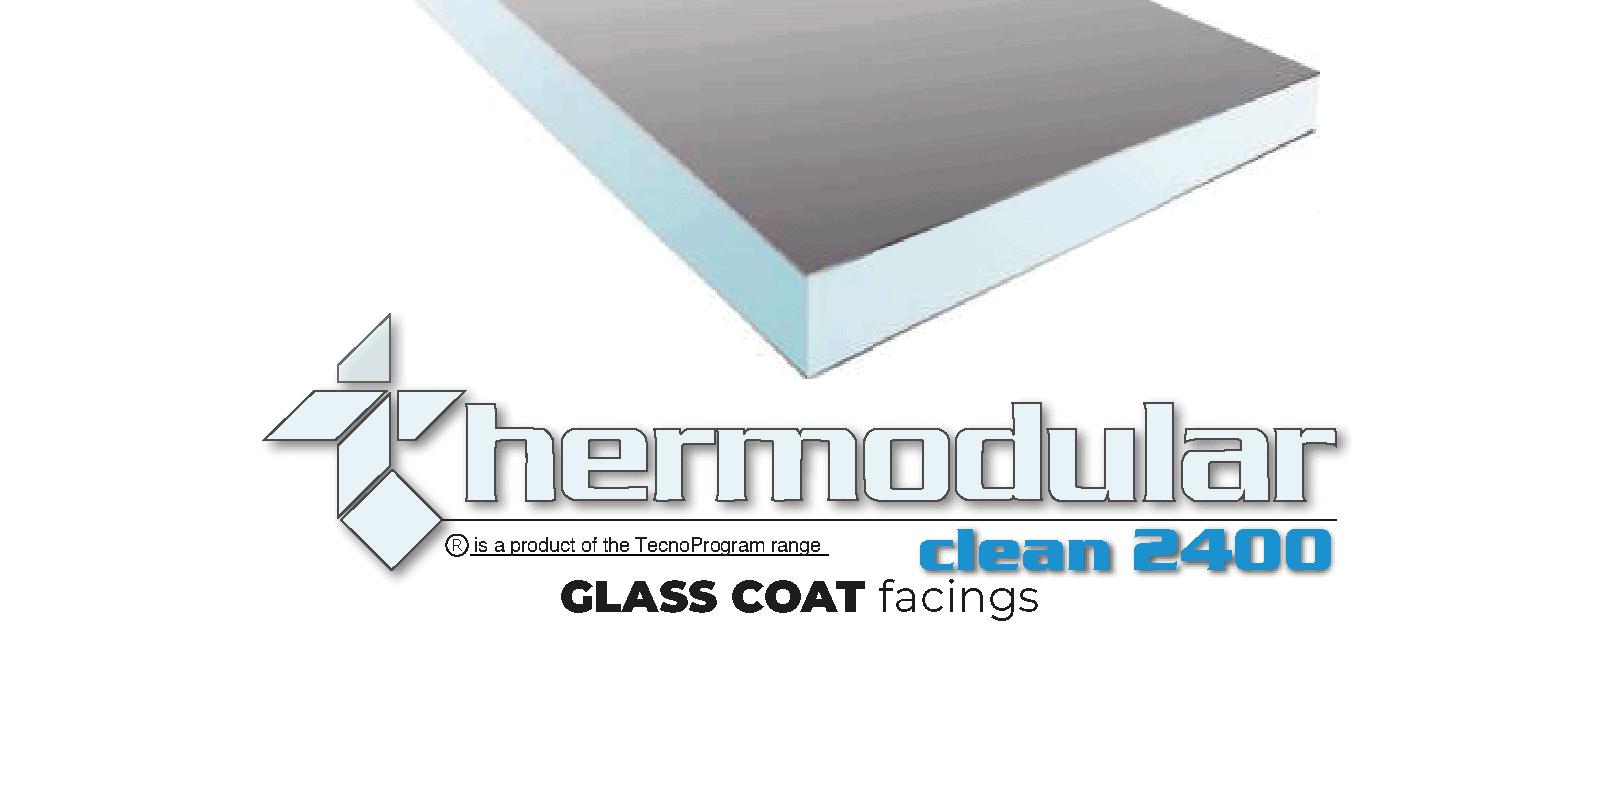 glass coat 2400 - products- pannelli termici srl